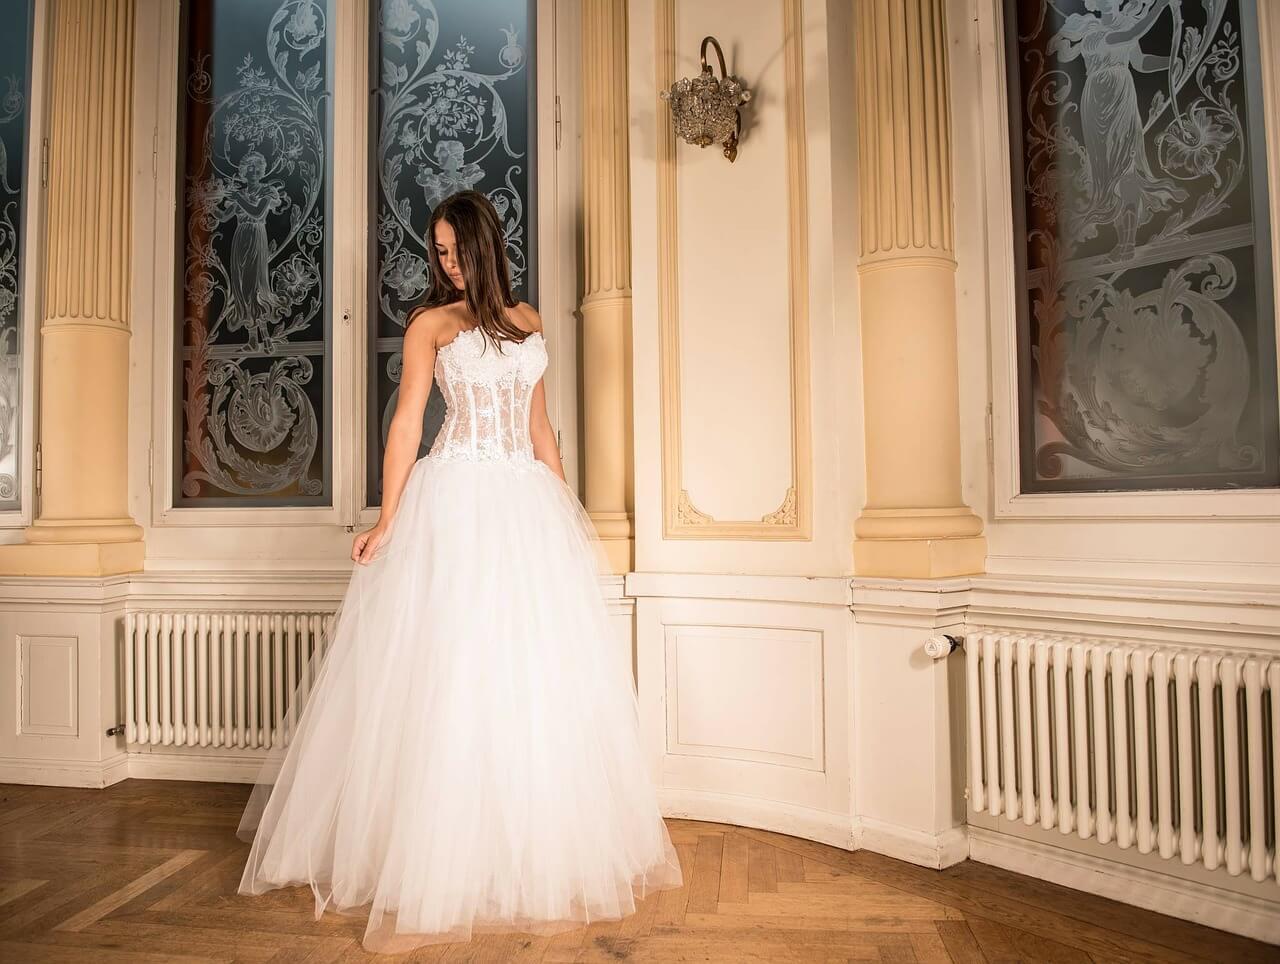 The Park Savoy Estate - Winter Wedding Dress Trends to Watch in 2017